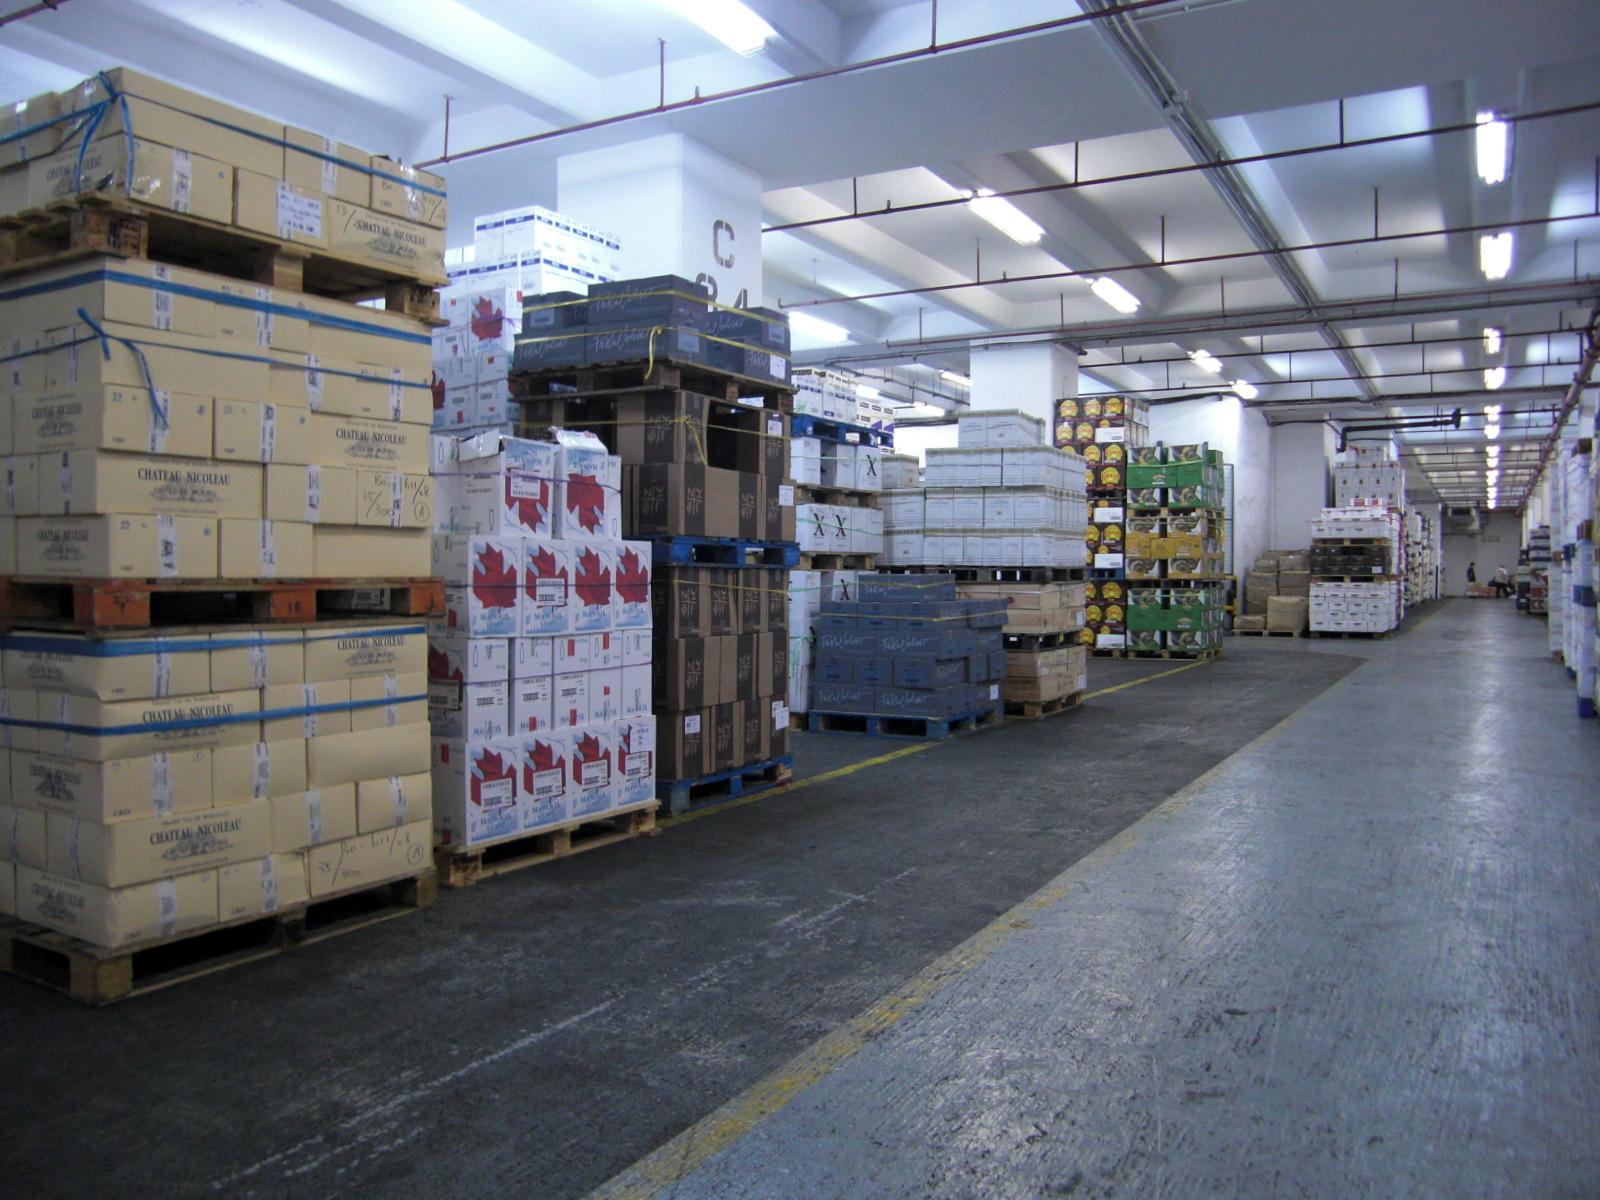 Bonded Warehouse for Tobacco & Hard Liquor